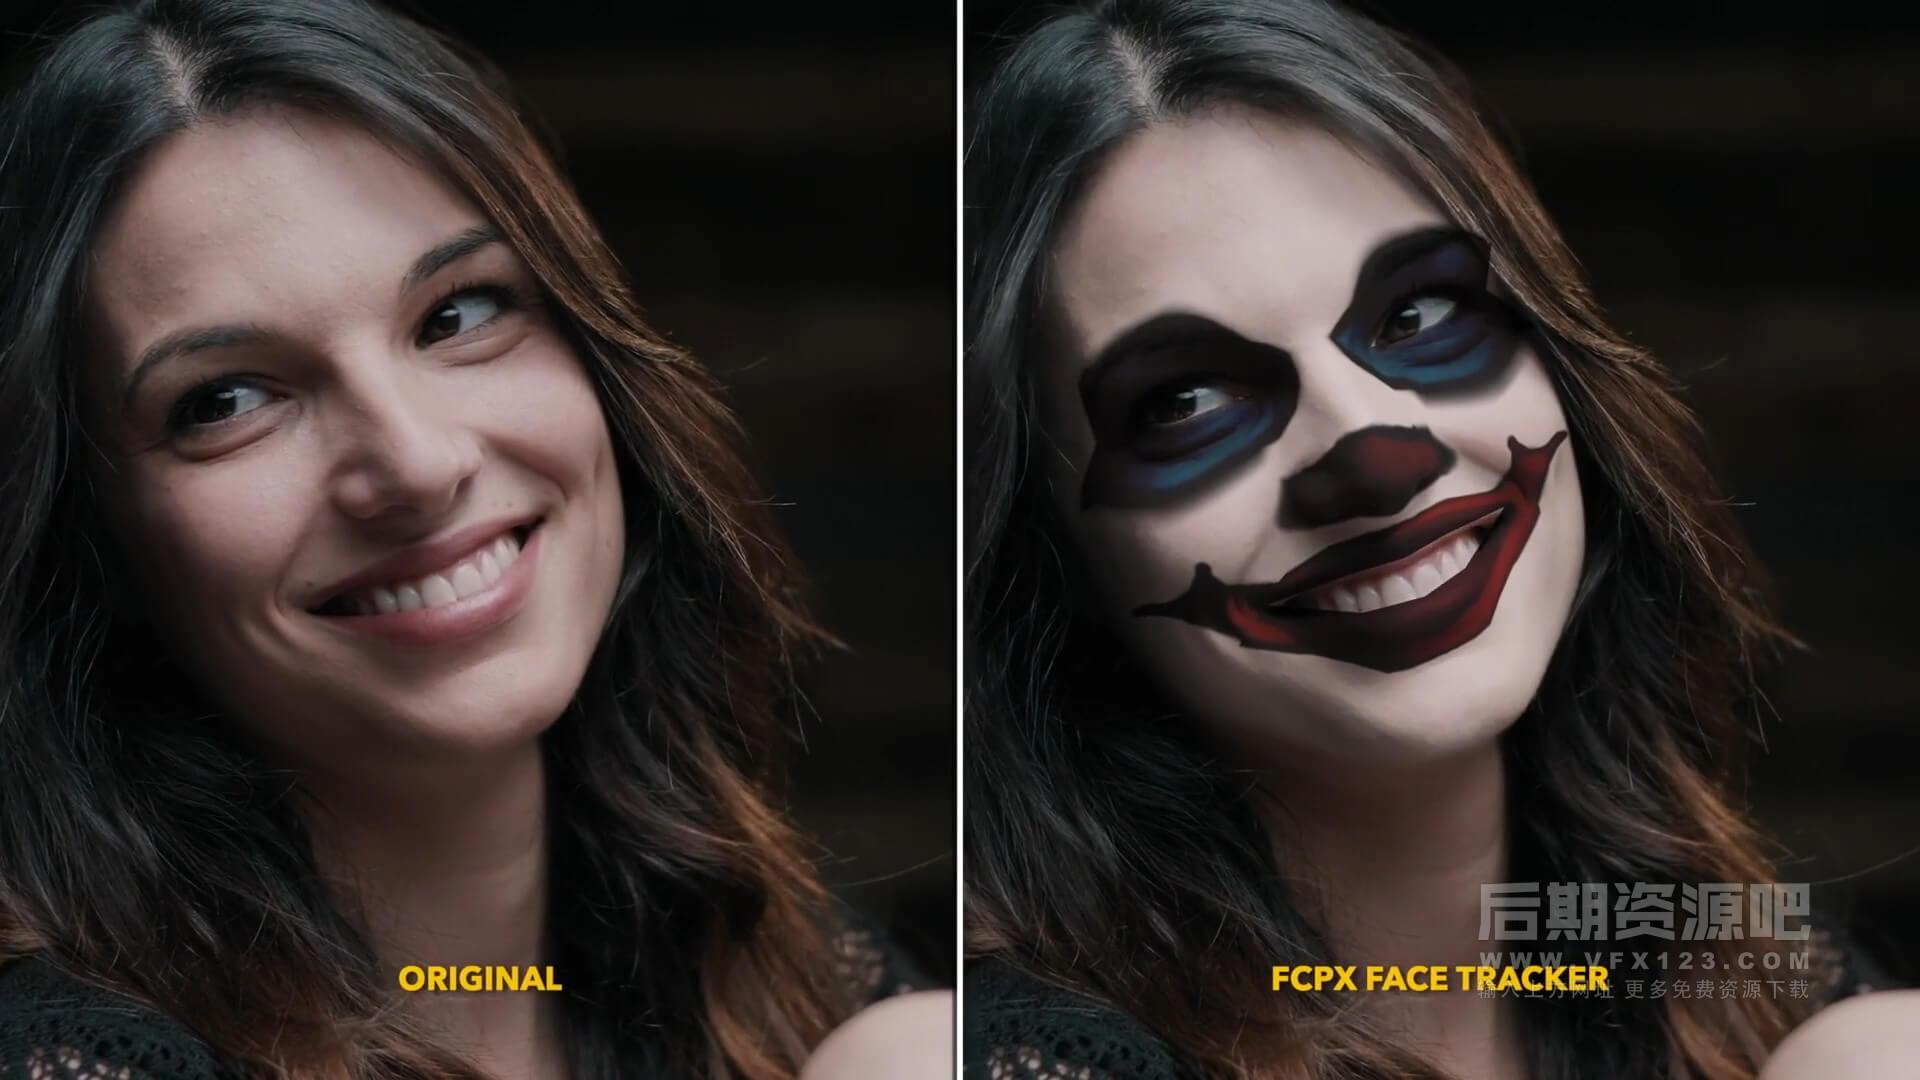 fcpx插件 面部跟踪工具自定义皮肤贴图美容化妆等 FCPX Face Tracker